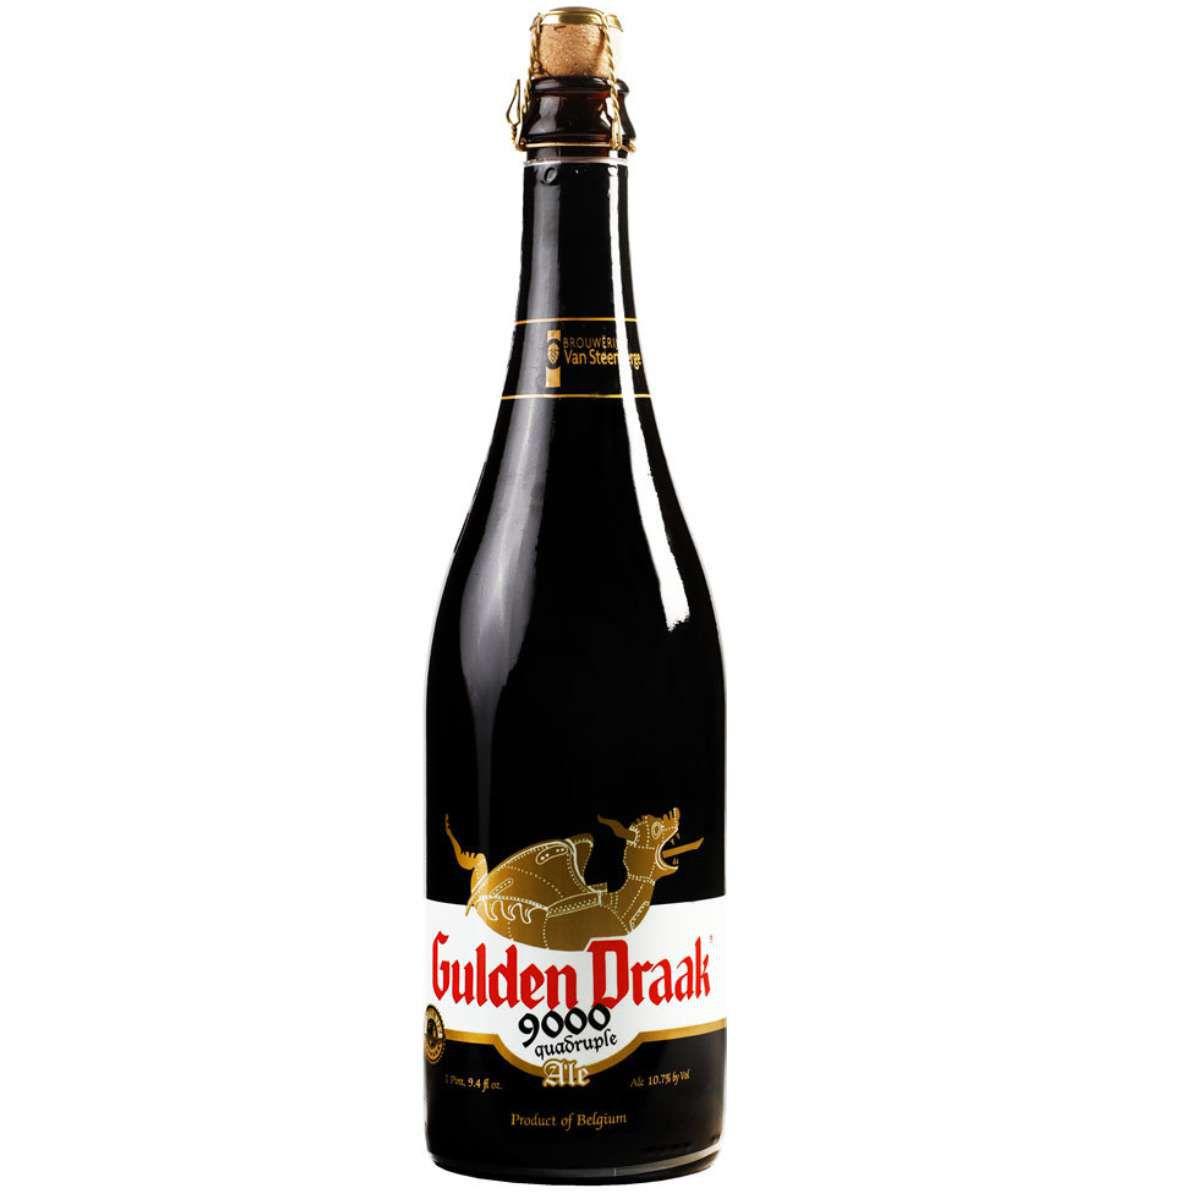 Gulden Draak 9000 750ml (Vencimento 25/09/2020)